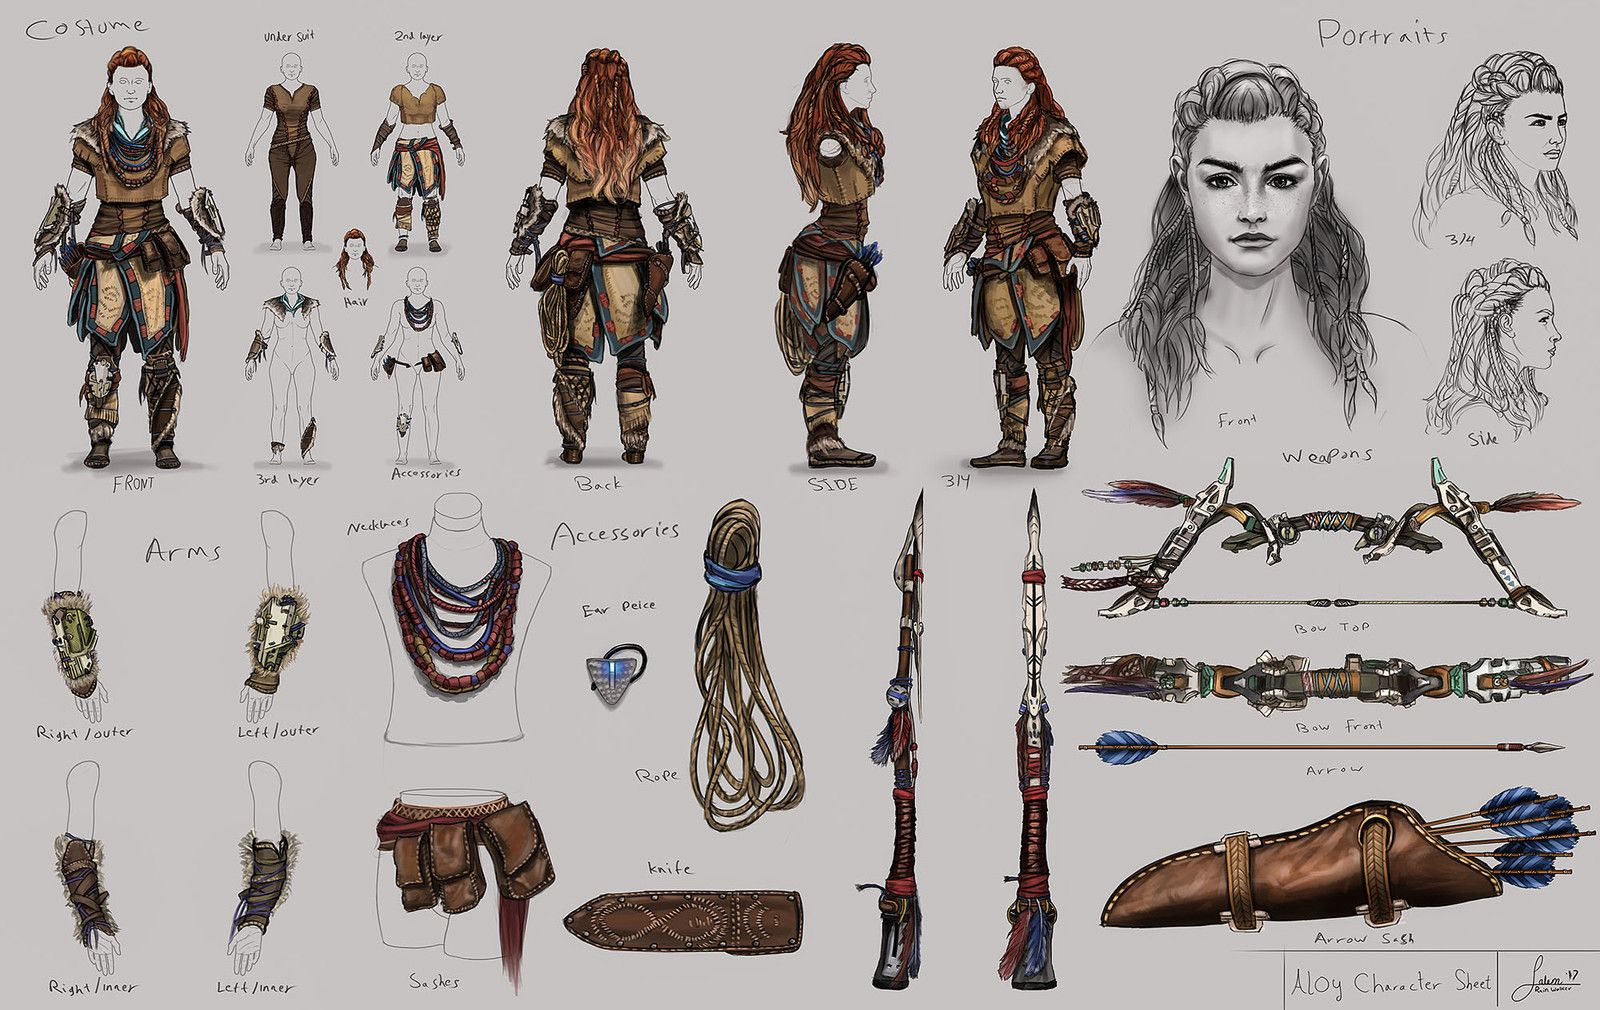 Character Design Study : Fan art quot aloy horizon new dawn character design study